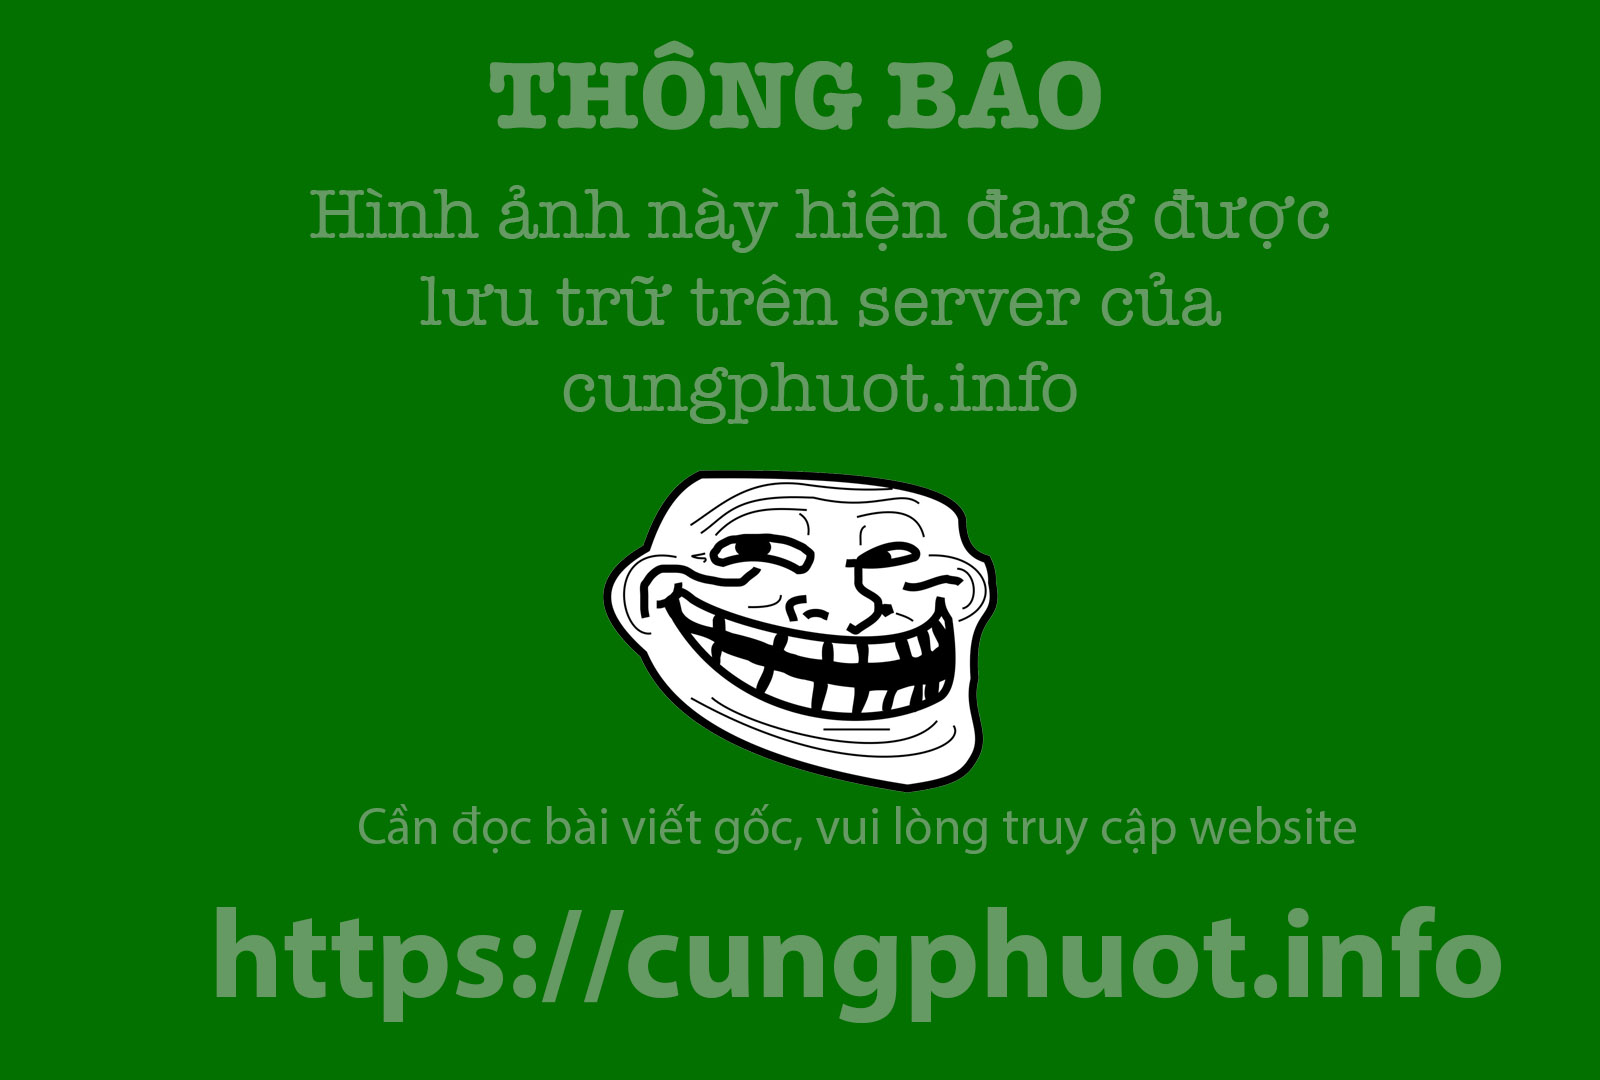 Co do Hue dep la trong suong mu hinh anh 6